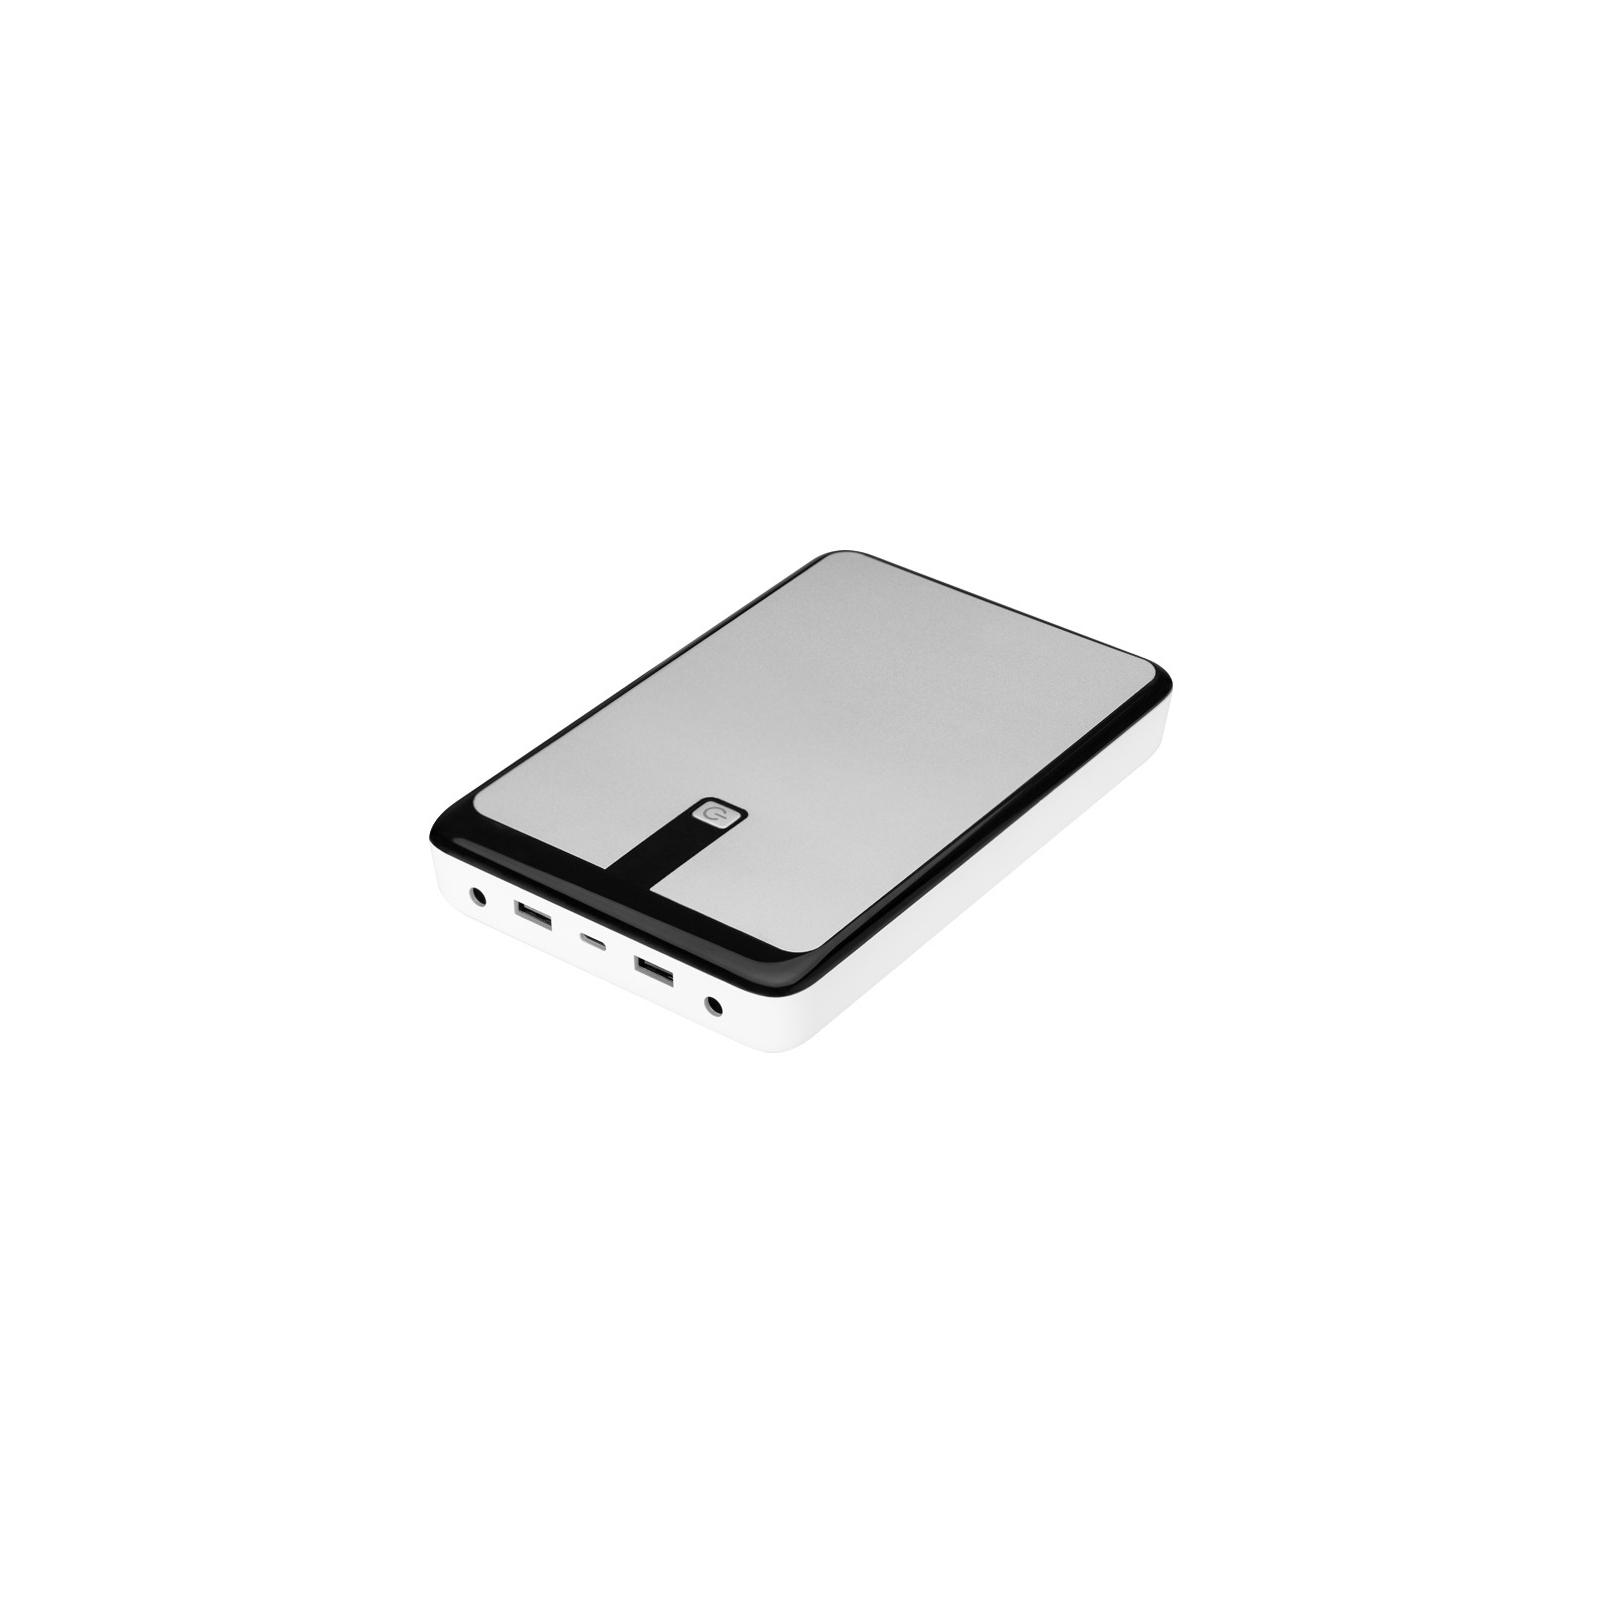 Батарея универсальная PowerPlant MS-125P3 30000mAh (PB930142)